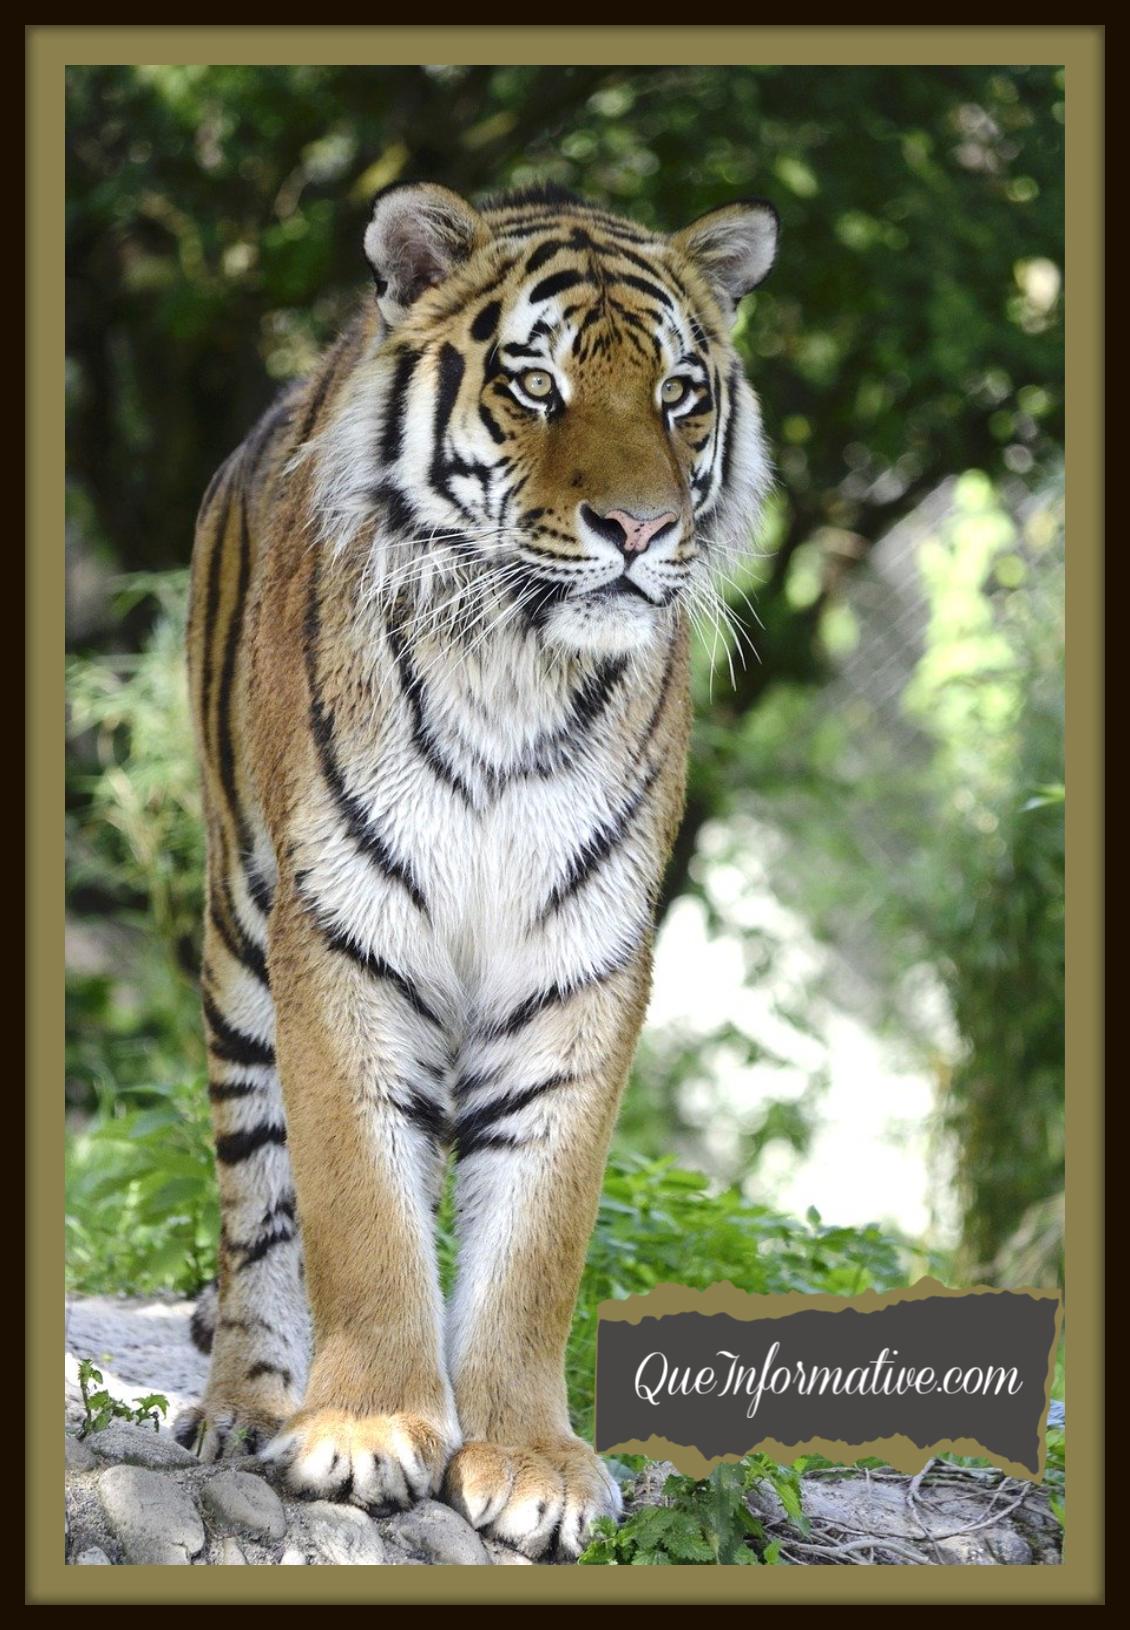 Beautiful Creatures Queinformative In 2020 Pet Tiger Big Cats Wild Animal Wallpaper